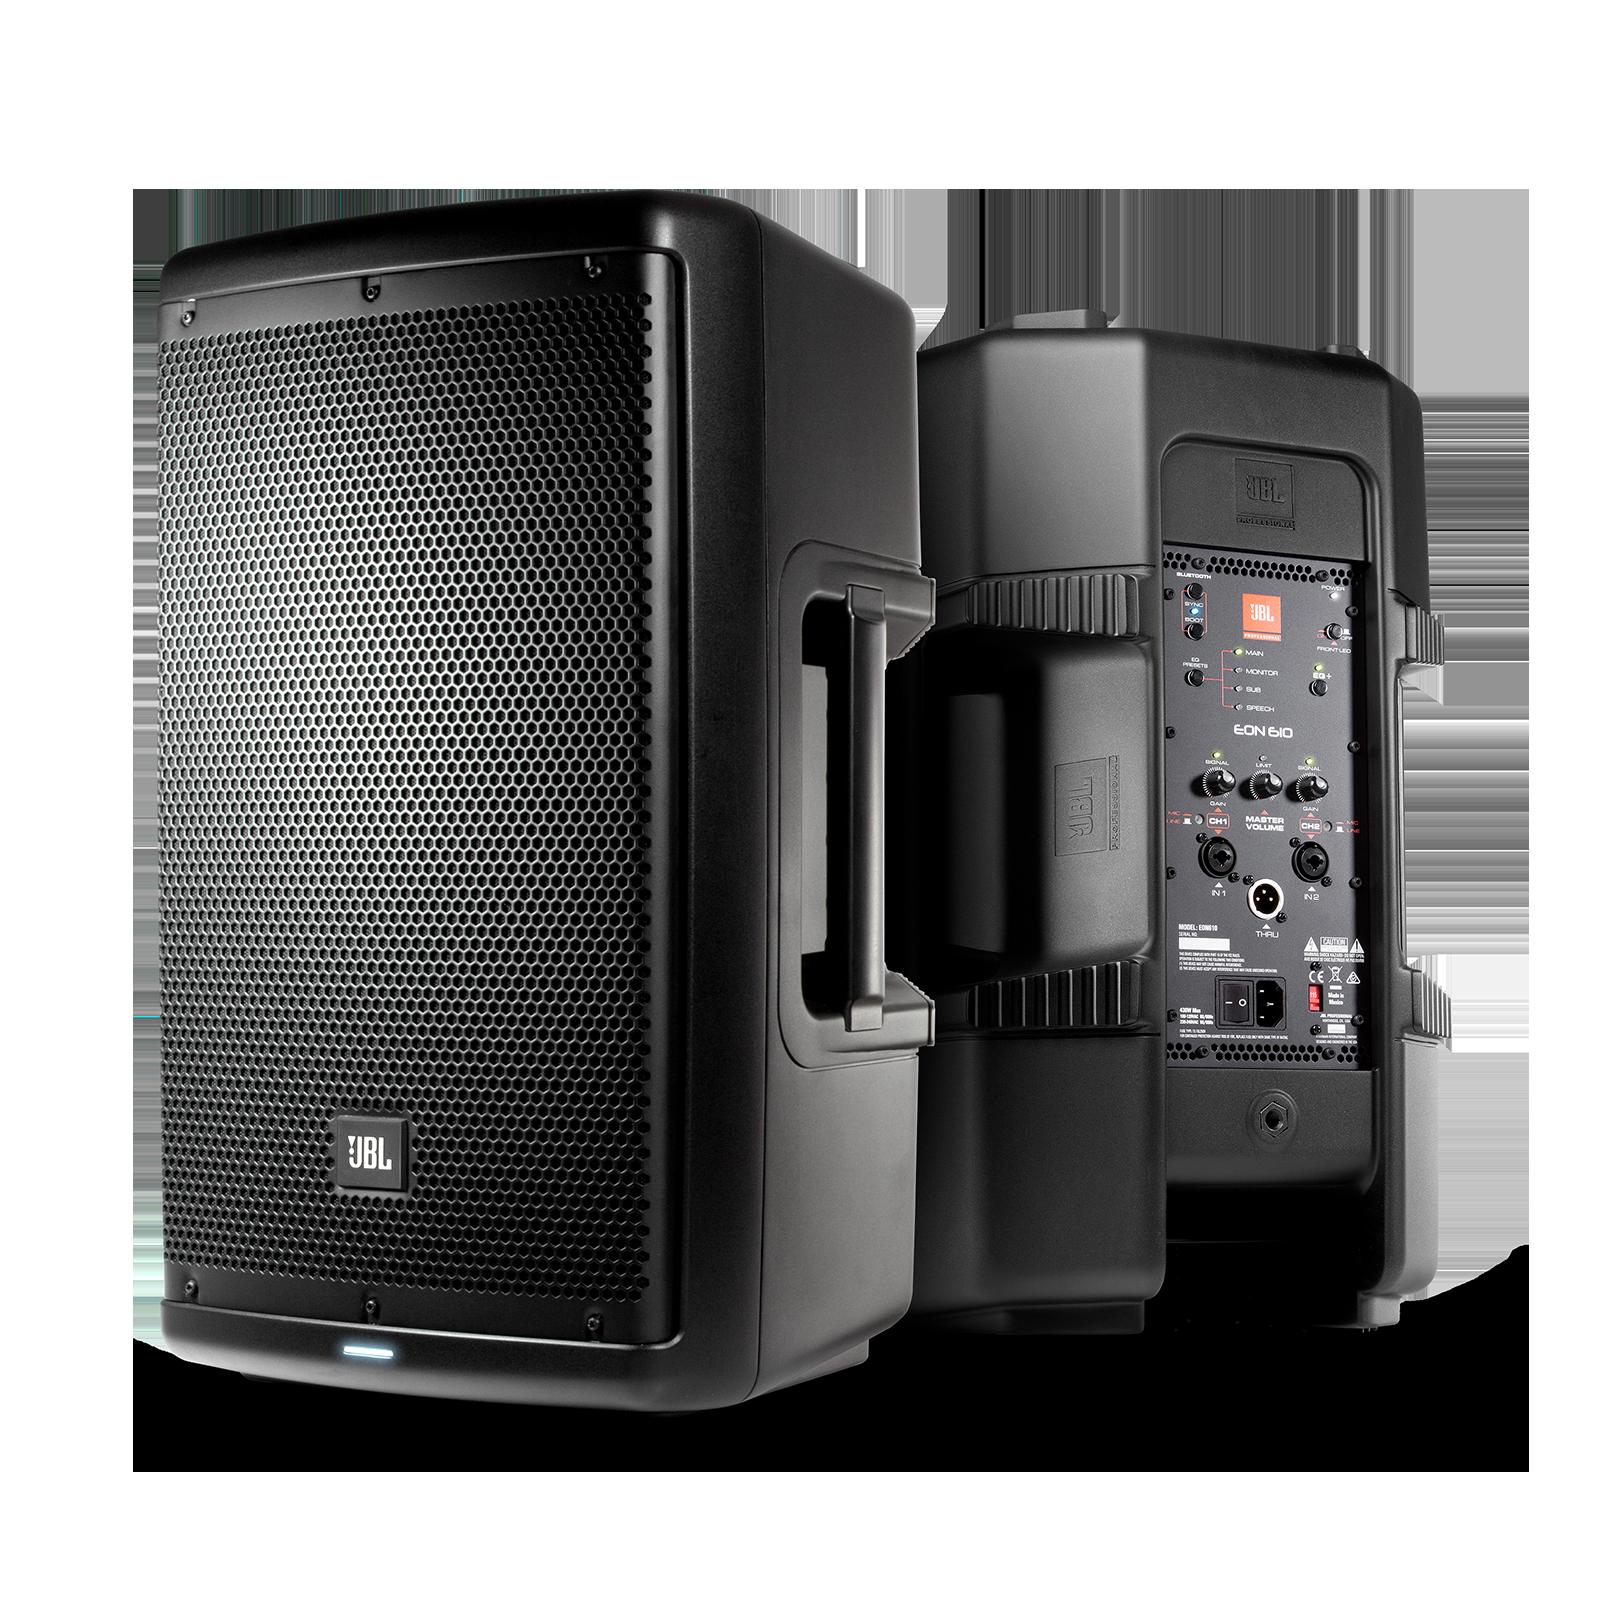 "JBL EON610 - Black - 10"" Two-Way Multipurpose Self-Powered Sound Reinforcement - Hero"